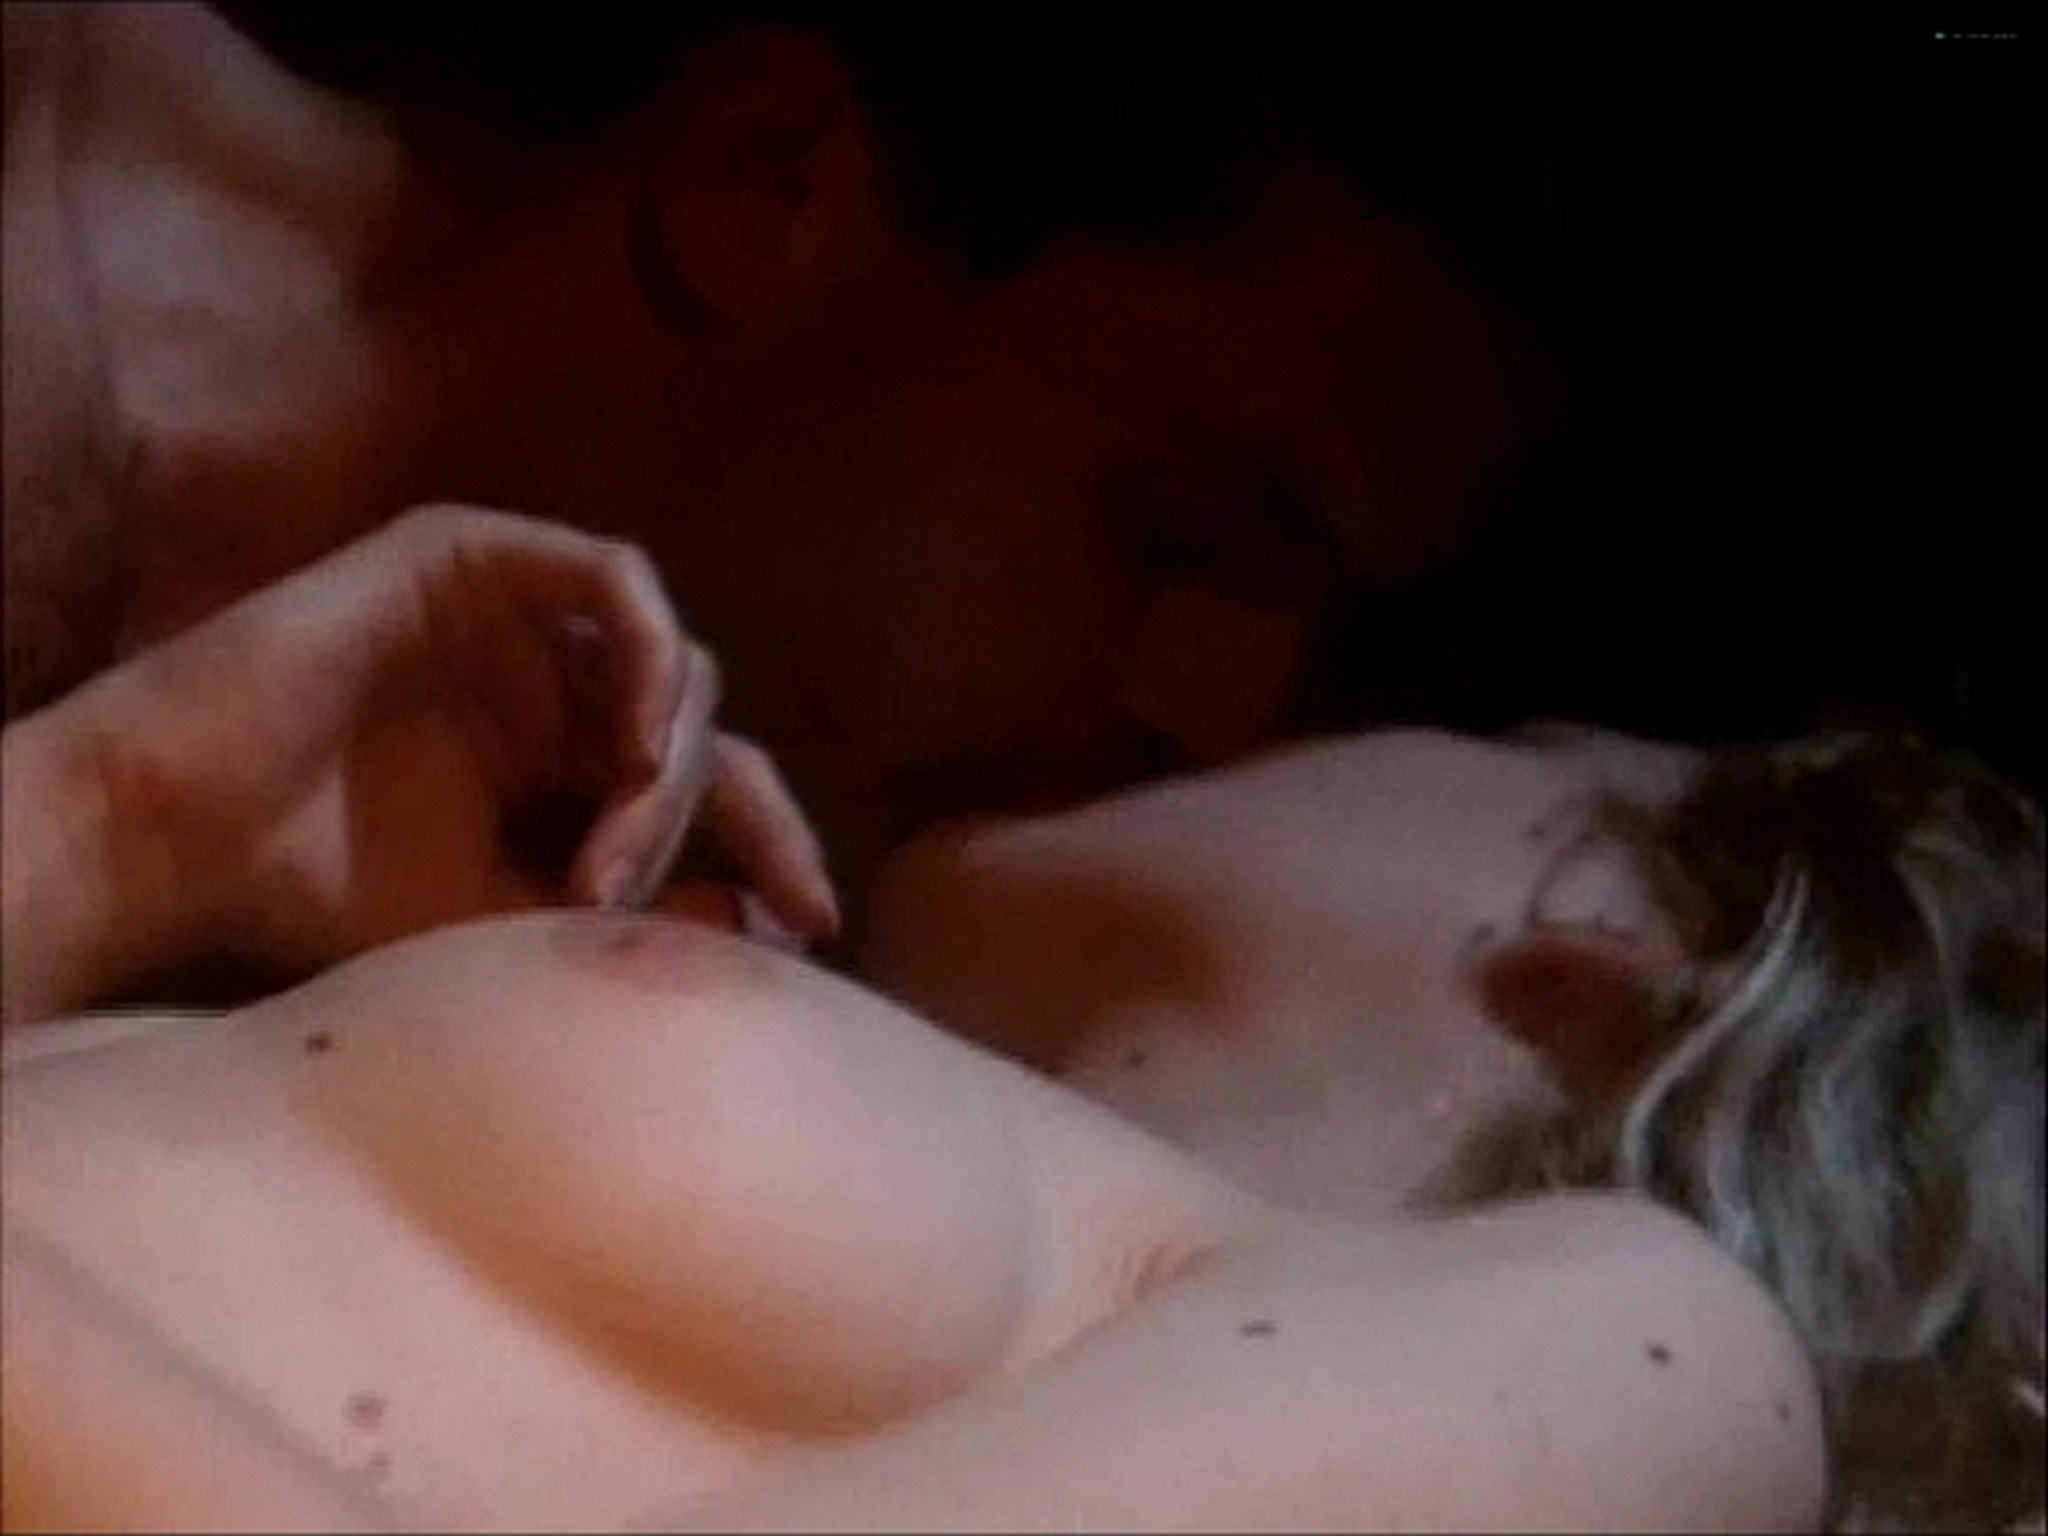 Malu nude full frontal and sex Lidija Zovkic Games of Desire IT 1991 VHSrip 016